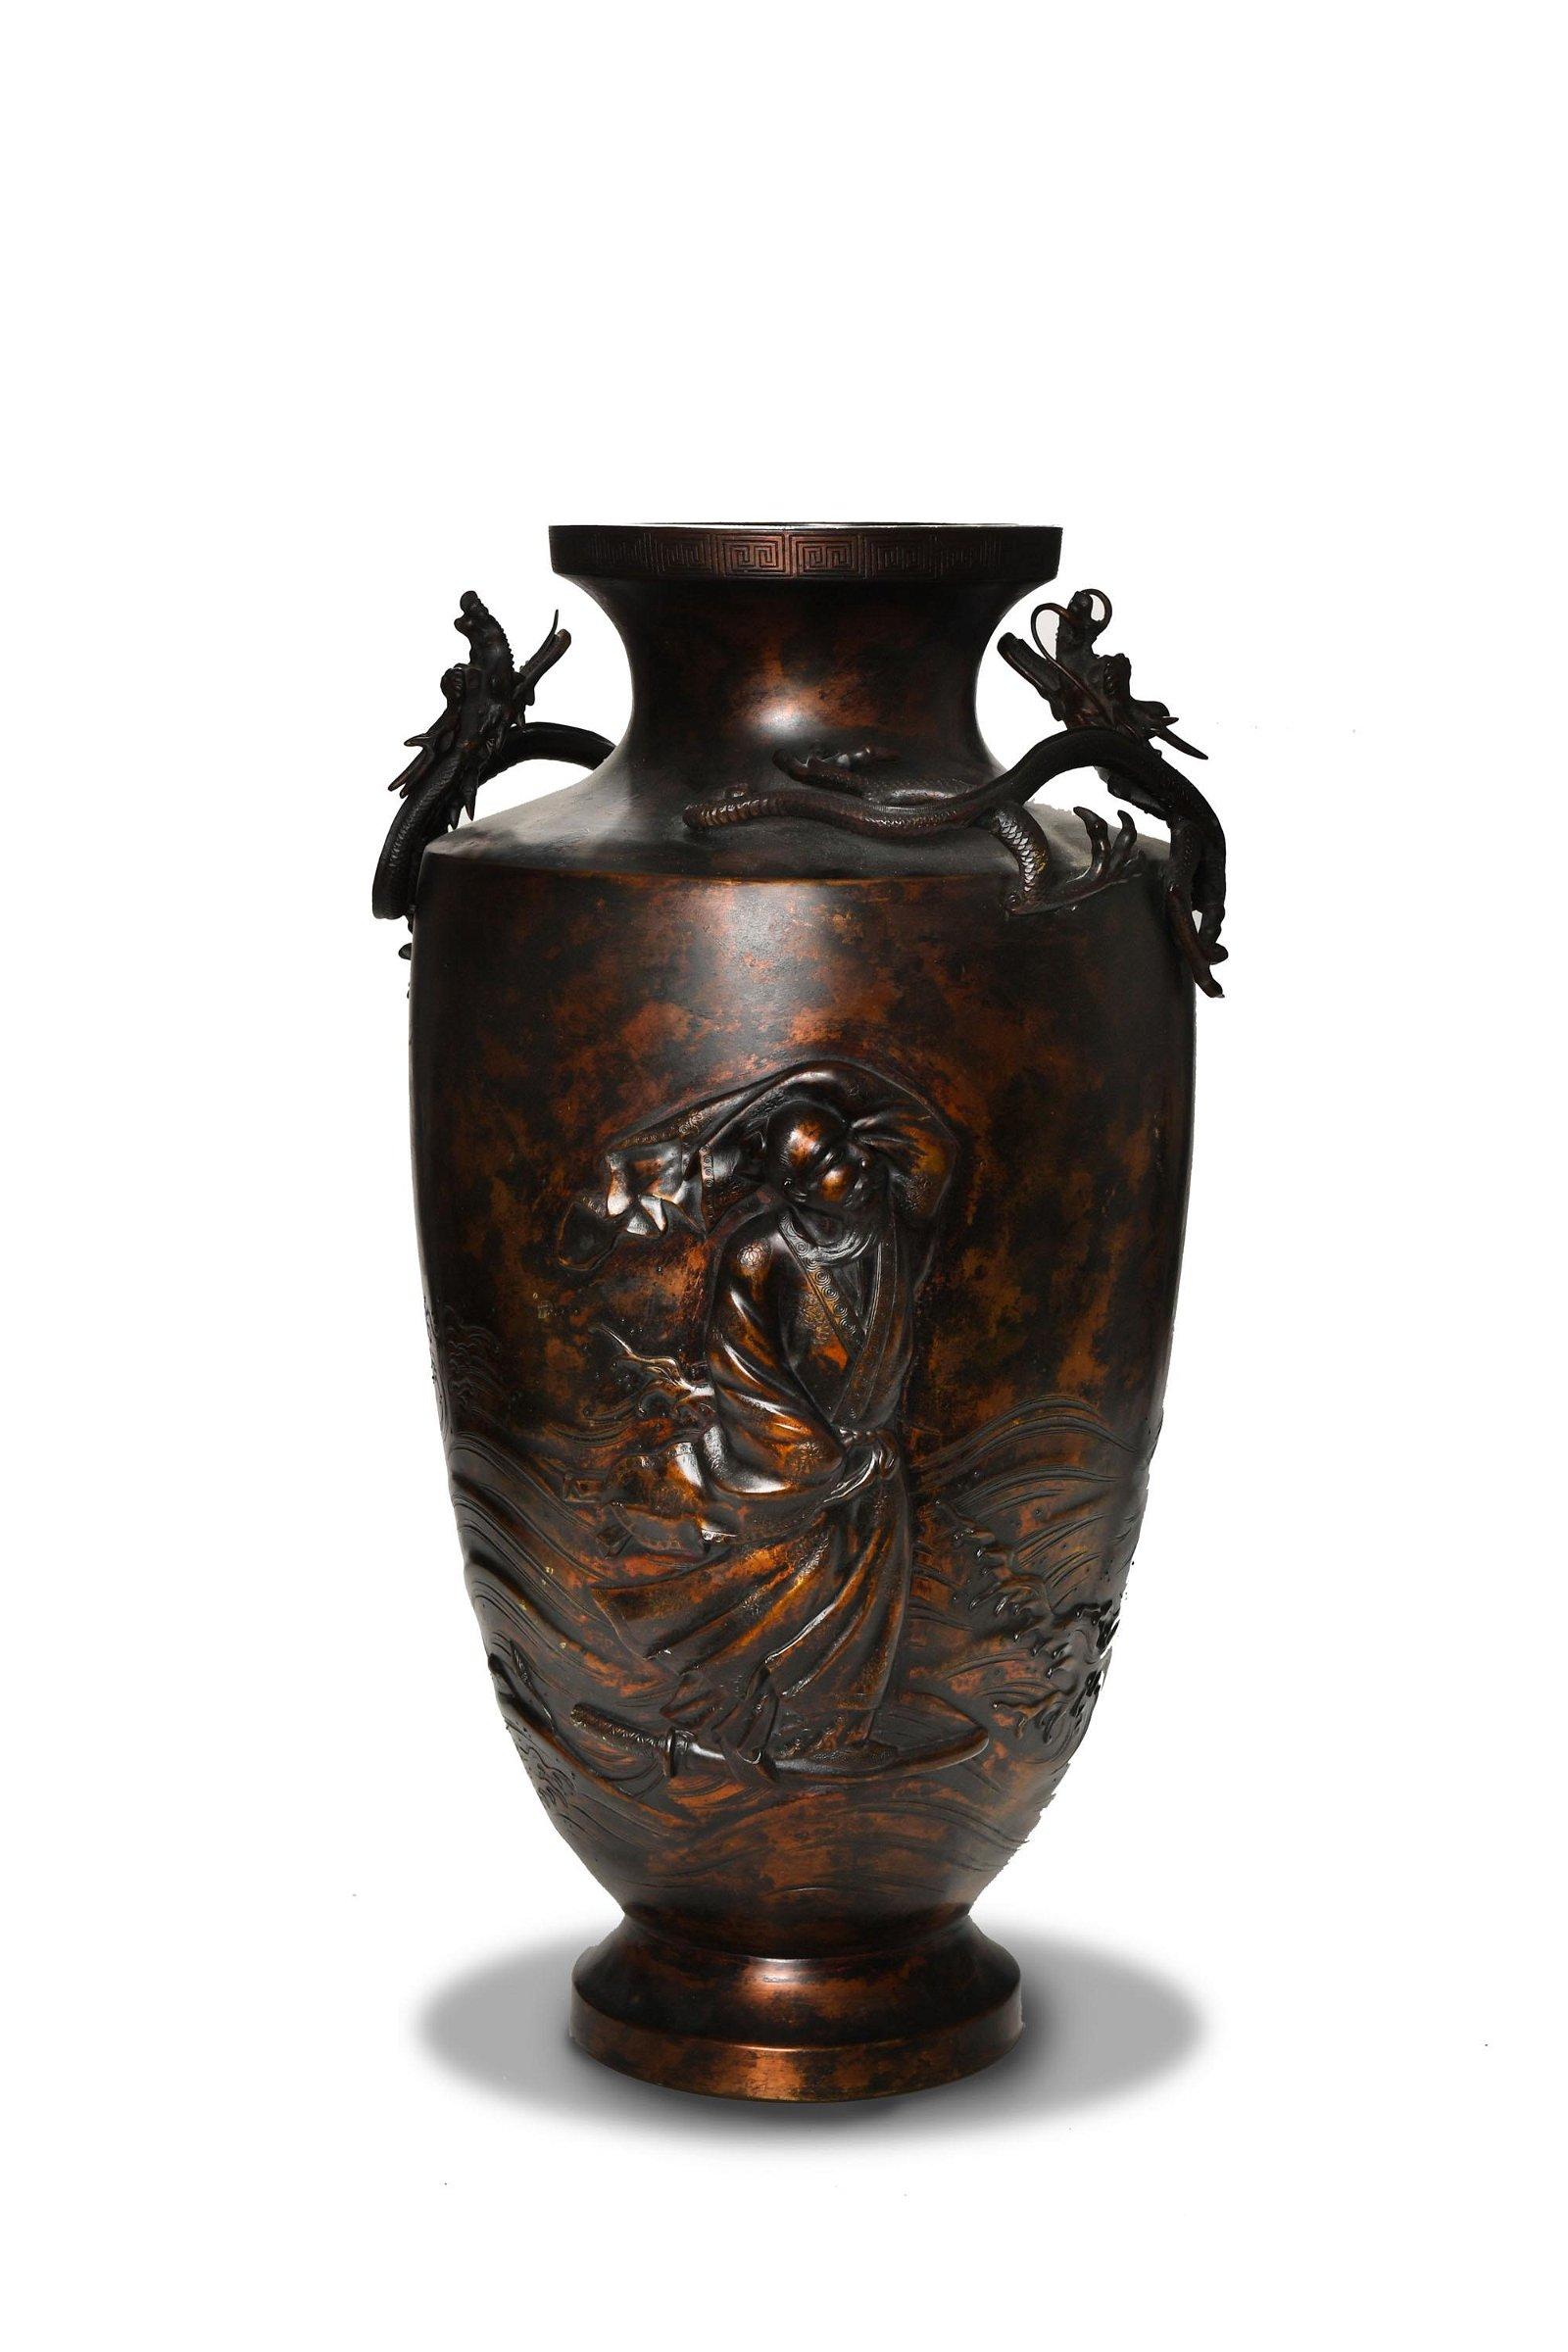 Japanese Bronze Vase, 19th Century